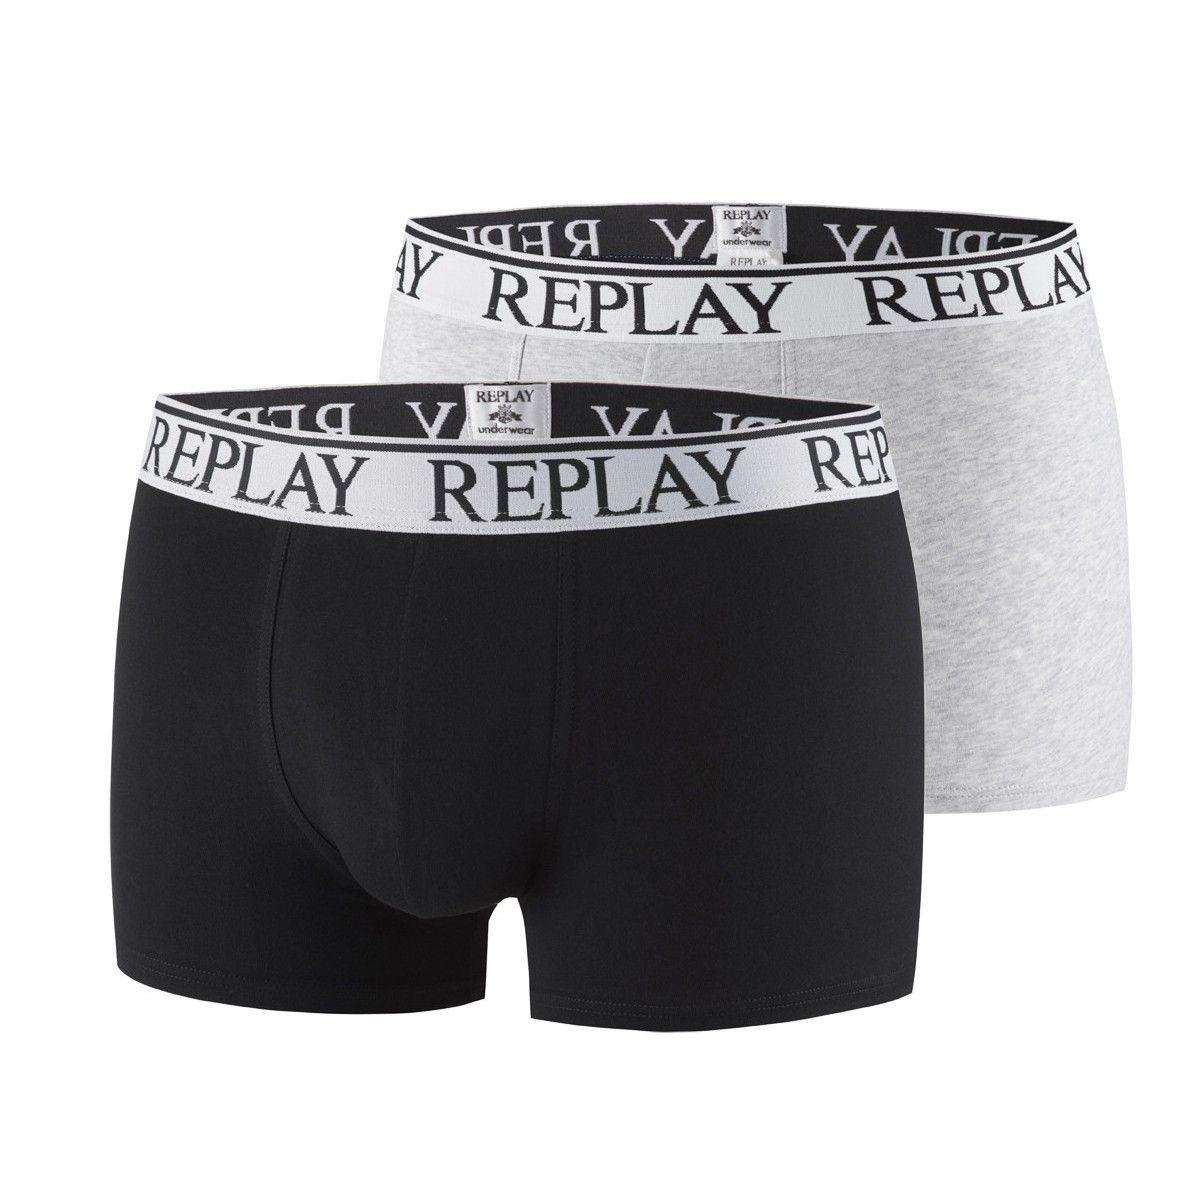 Pack de 2 boxers fashion pour homme Replay